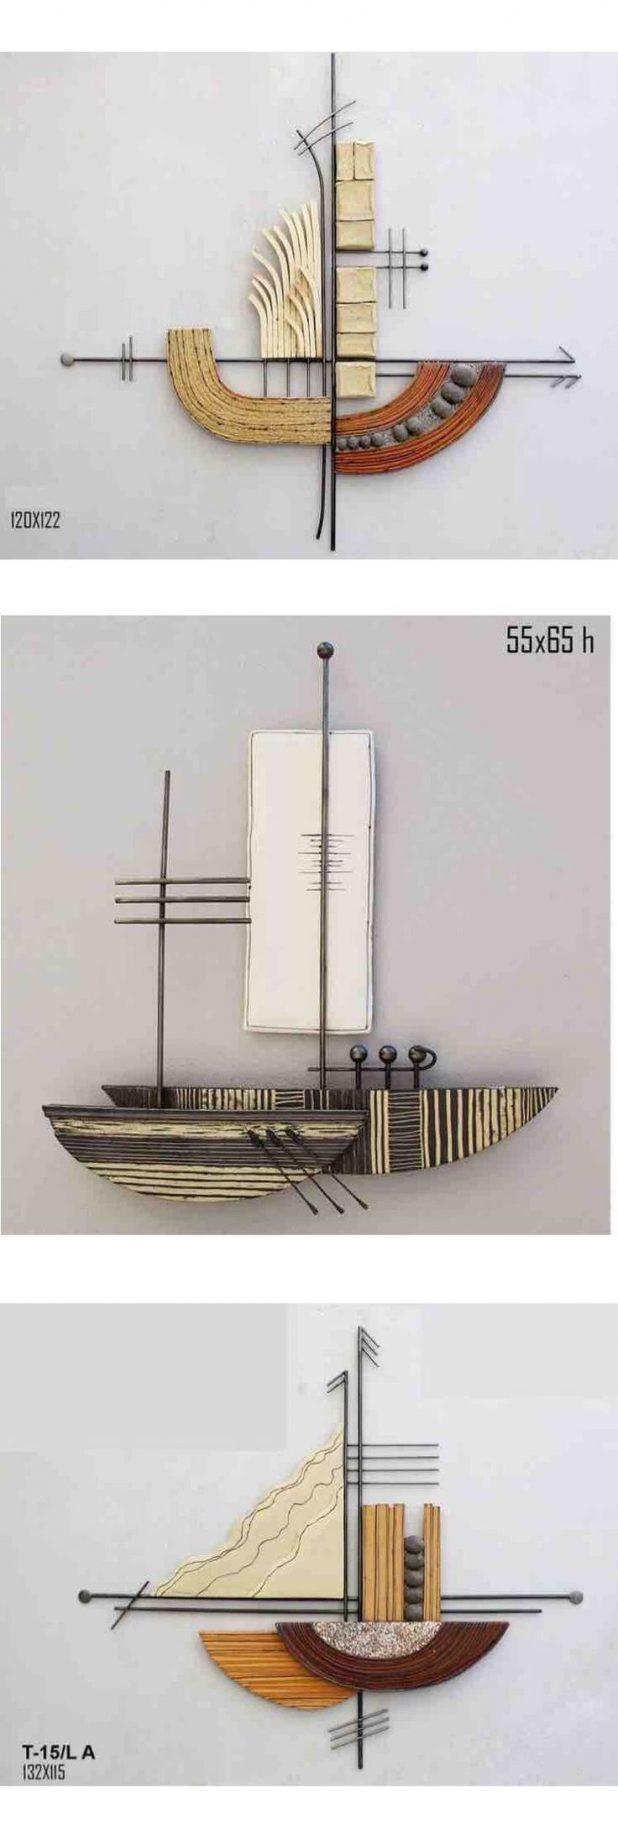 Amazing Metal Sailboat Wall Art Price Design Decor Metal Sailing Throughout Metal Sailboat Wall Art (View 20 of 20)